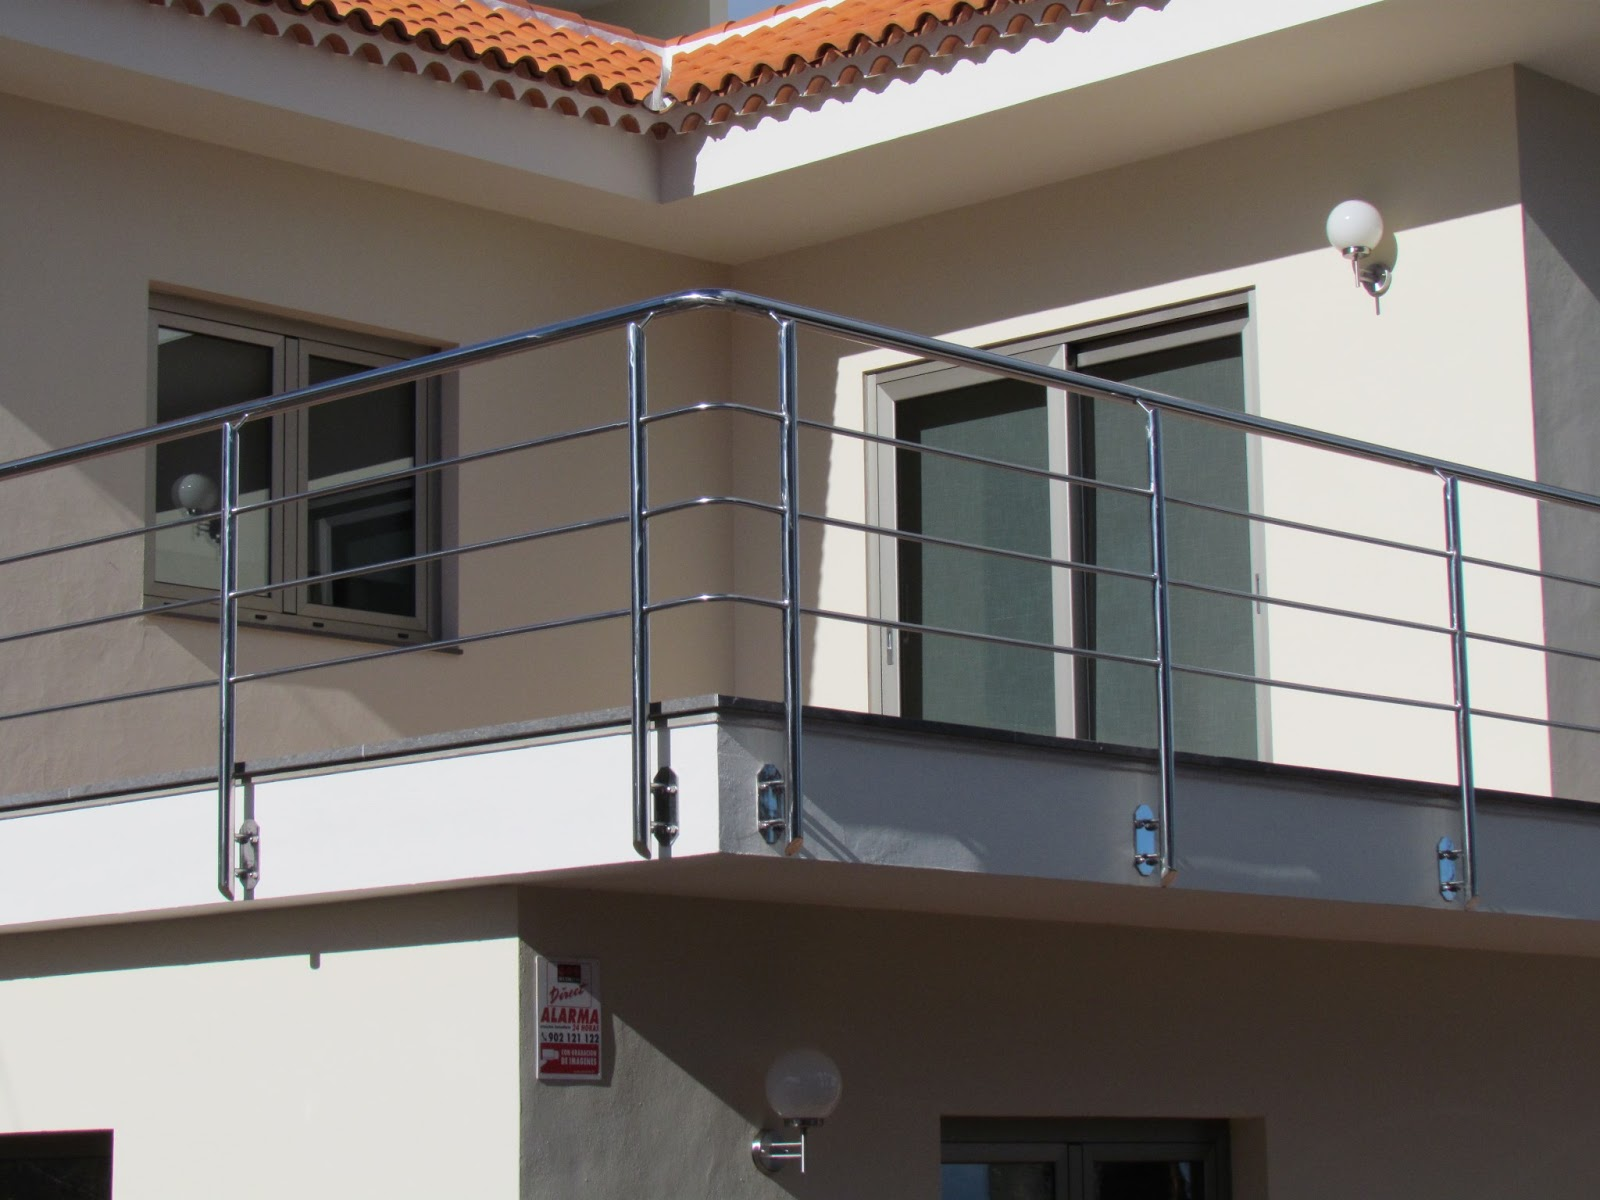 Acero inoxidable tenerife 7 modelos de barandilla acero for Barandilla escalera exterior